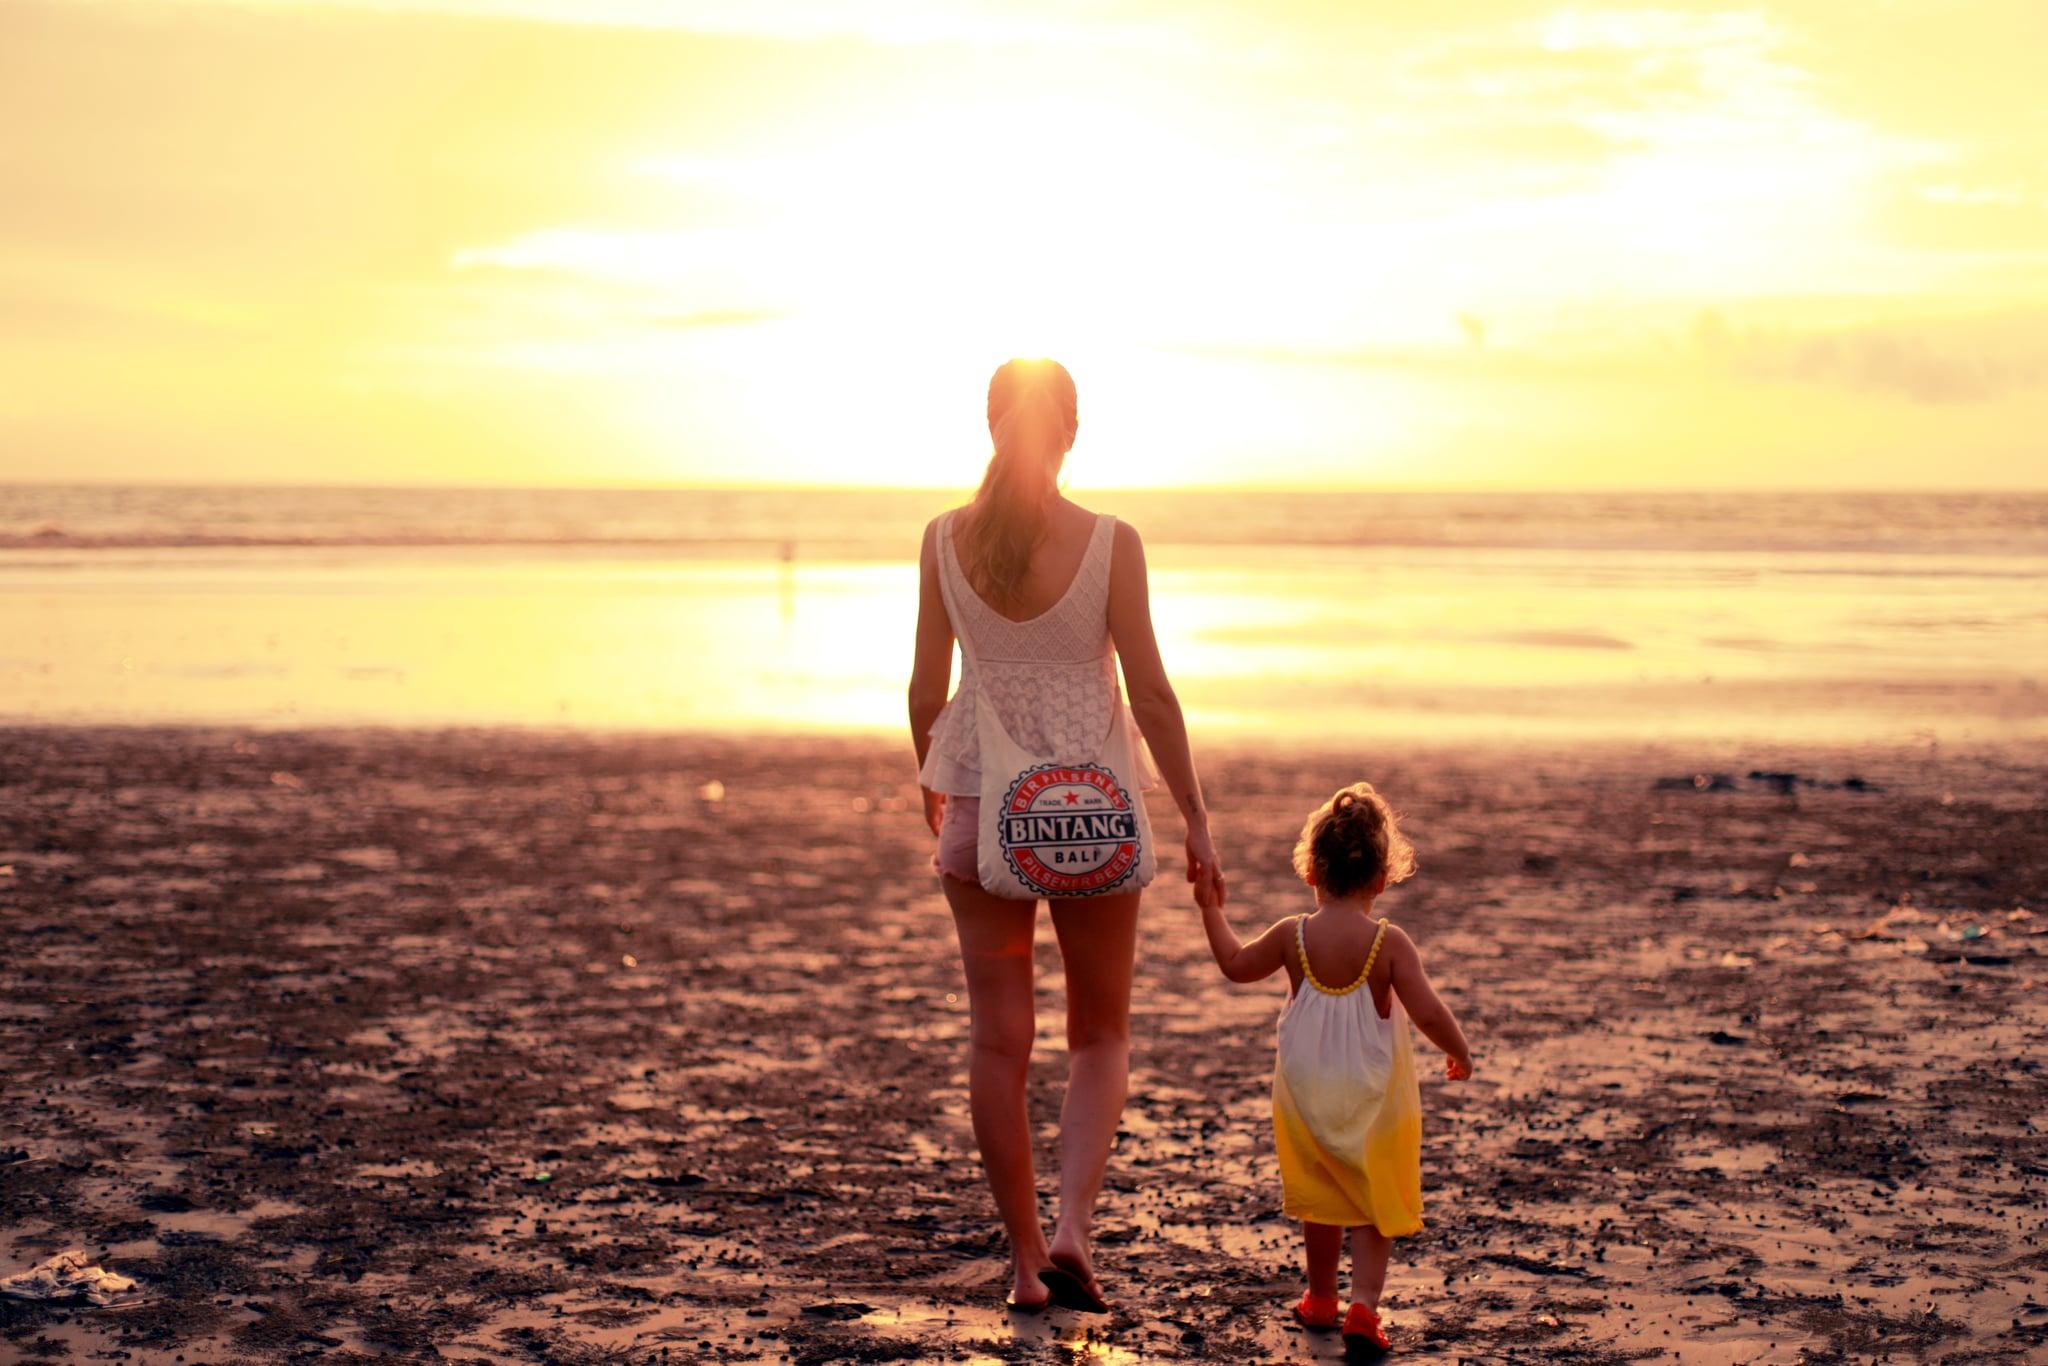 Stepmoms According to Zodiac Signs | POPSUGAR Family